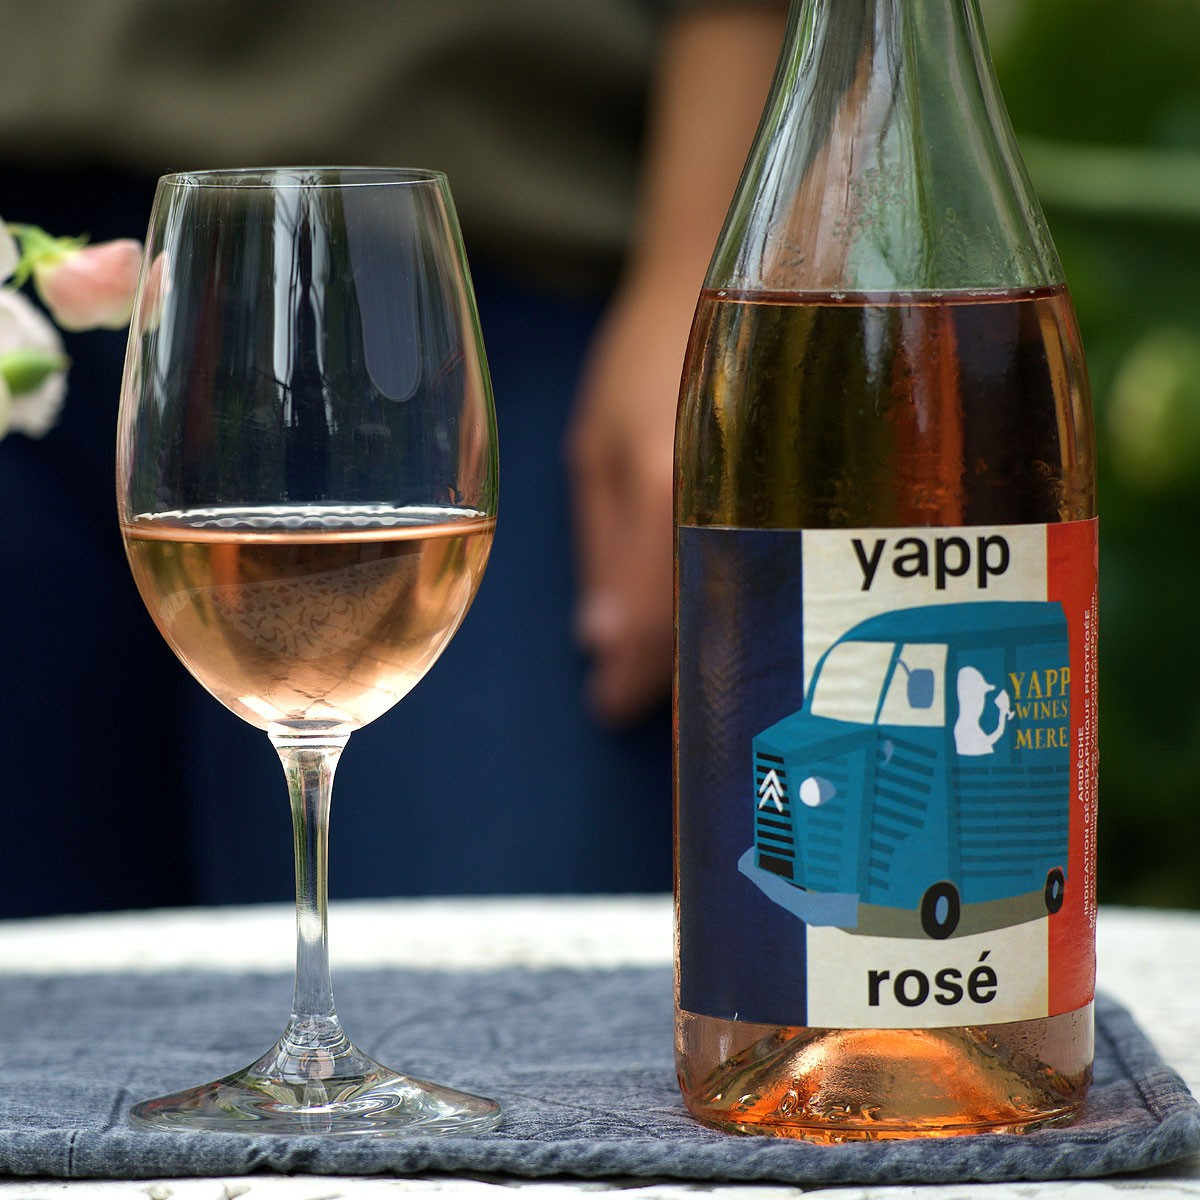 Yapp Rosé 2020 - Lifestyle